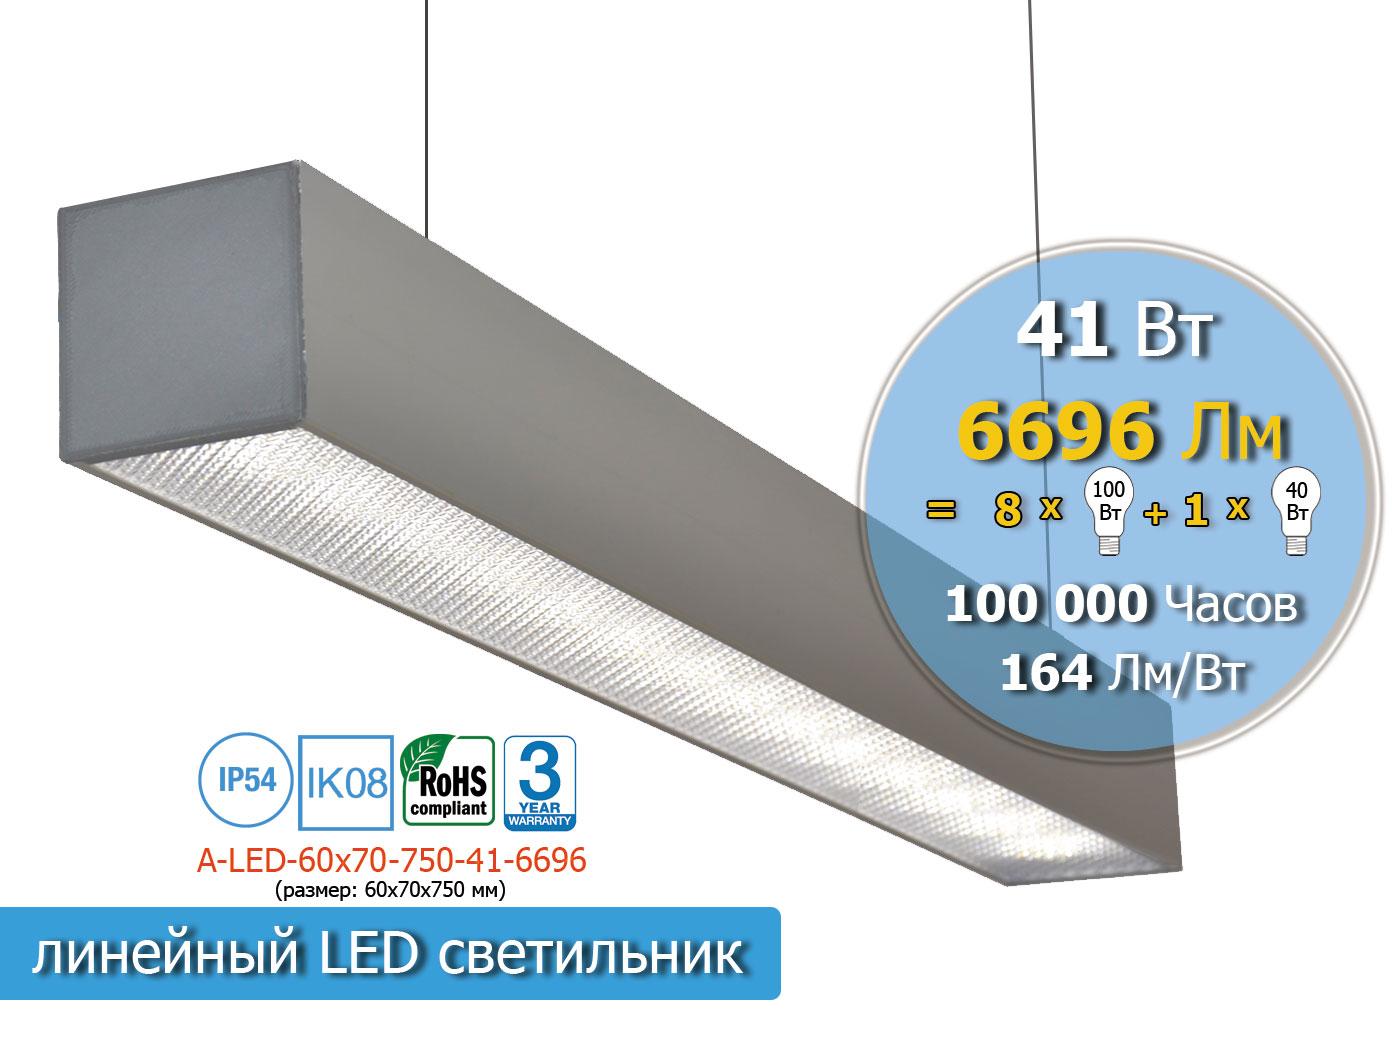 A-LED-60х70-750-41-6696